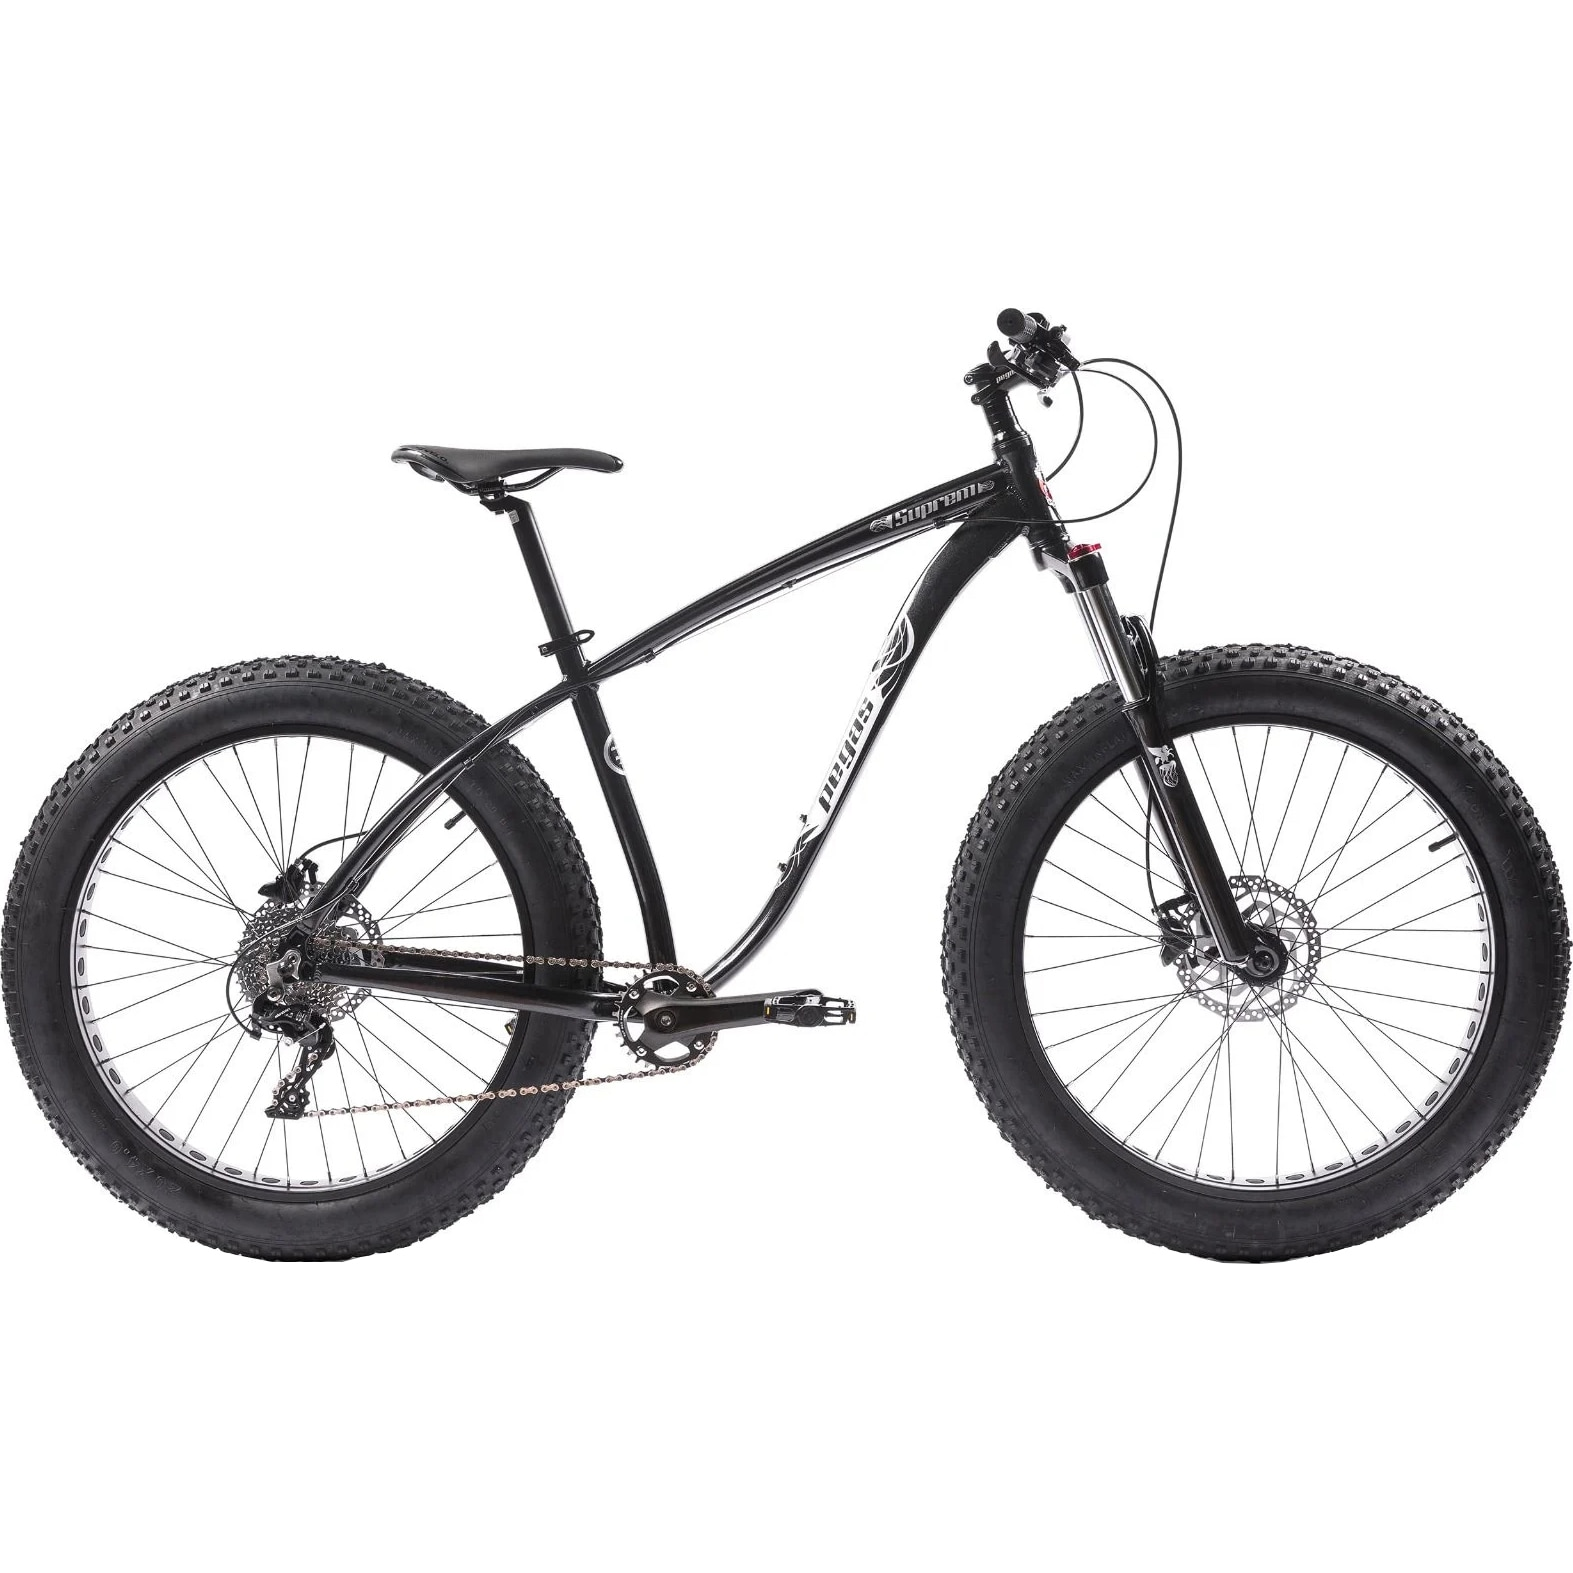 Fotografie Bicicleta Pegas Fat Bike Suprem AM18, 10s, Negru Stelar